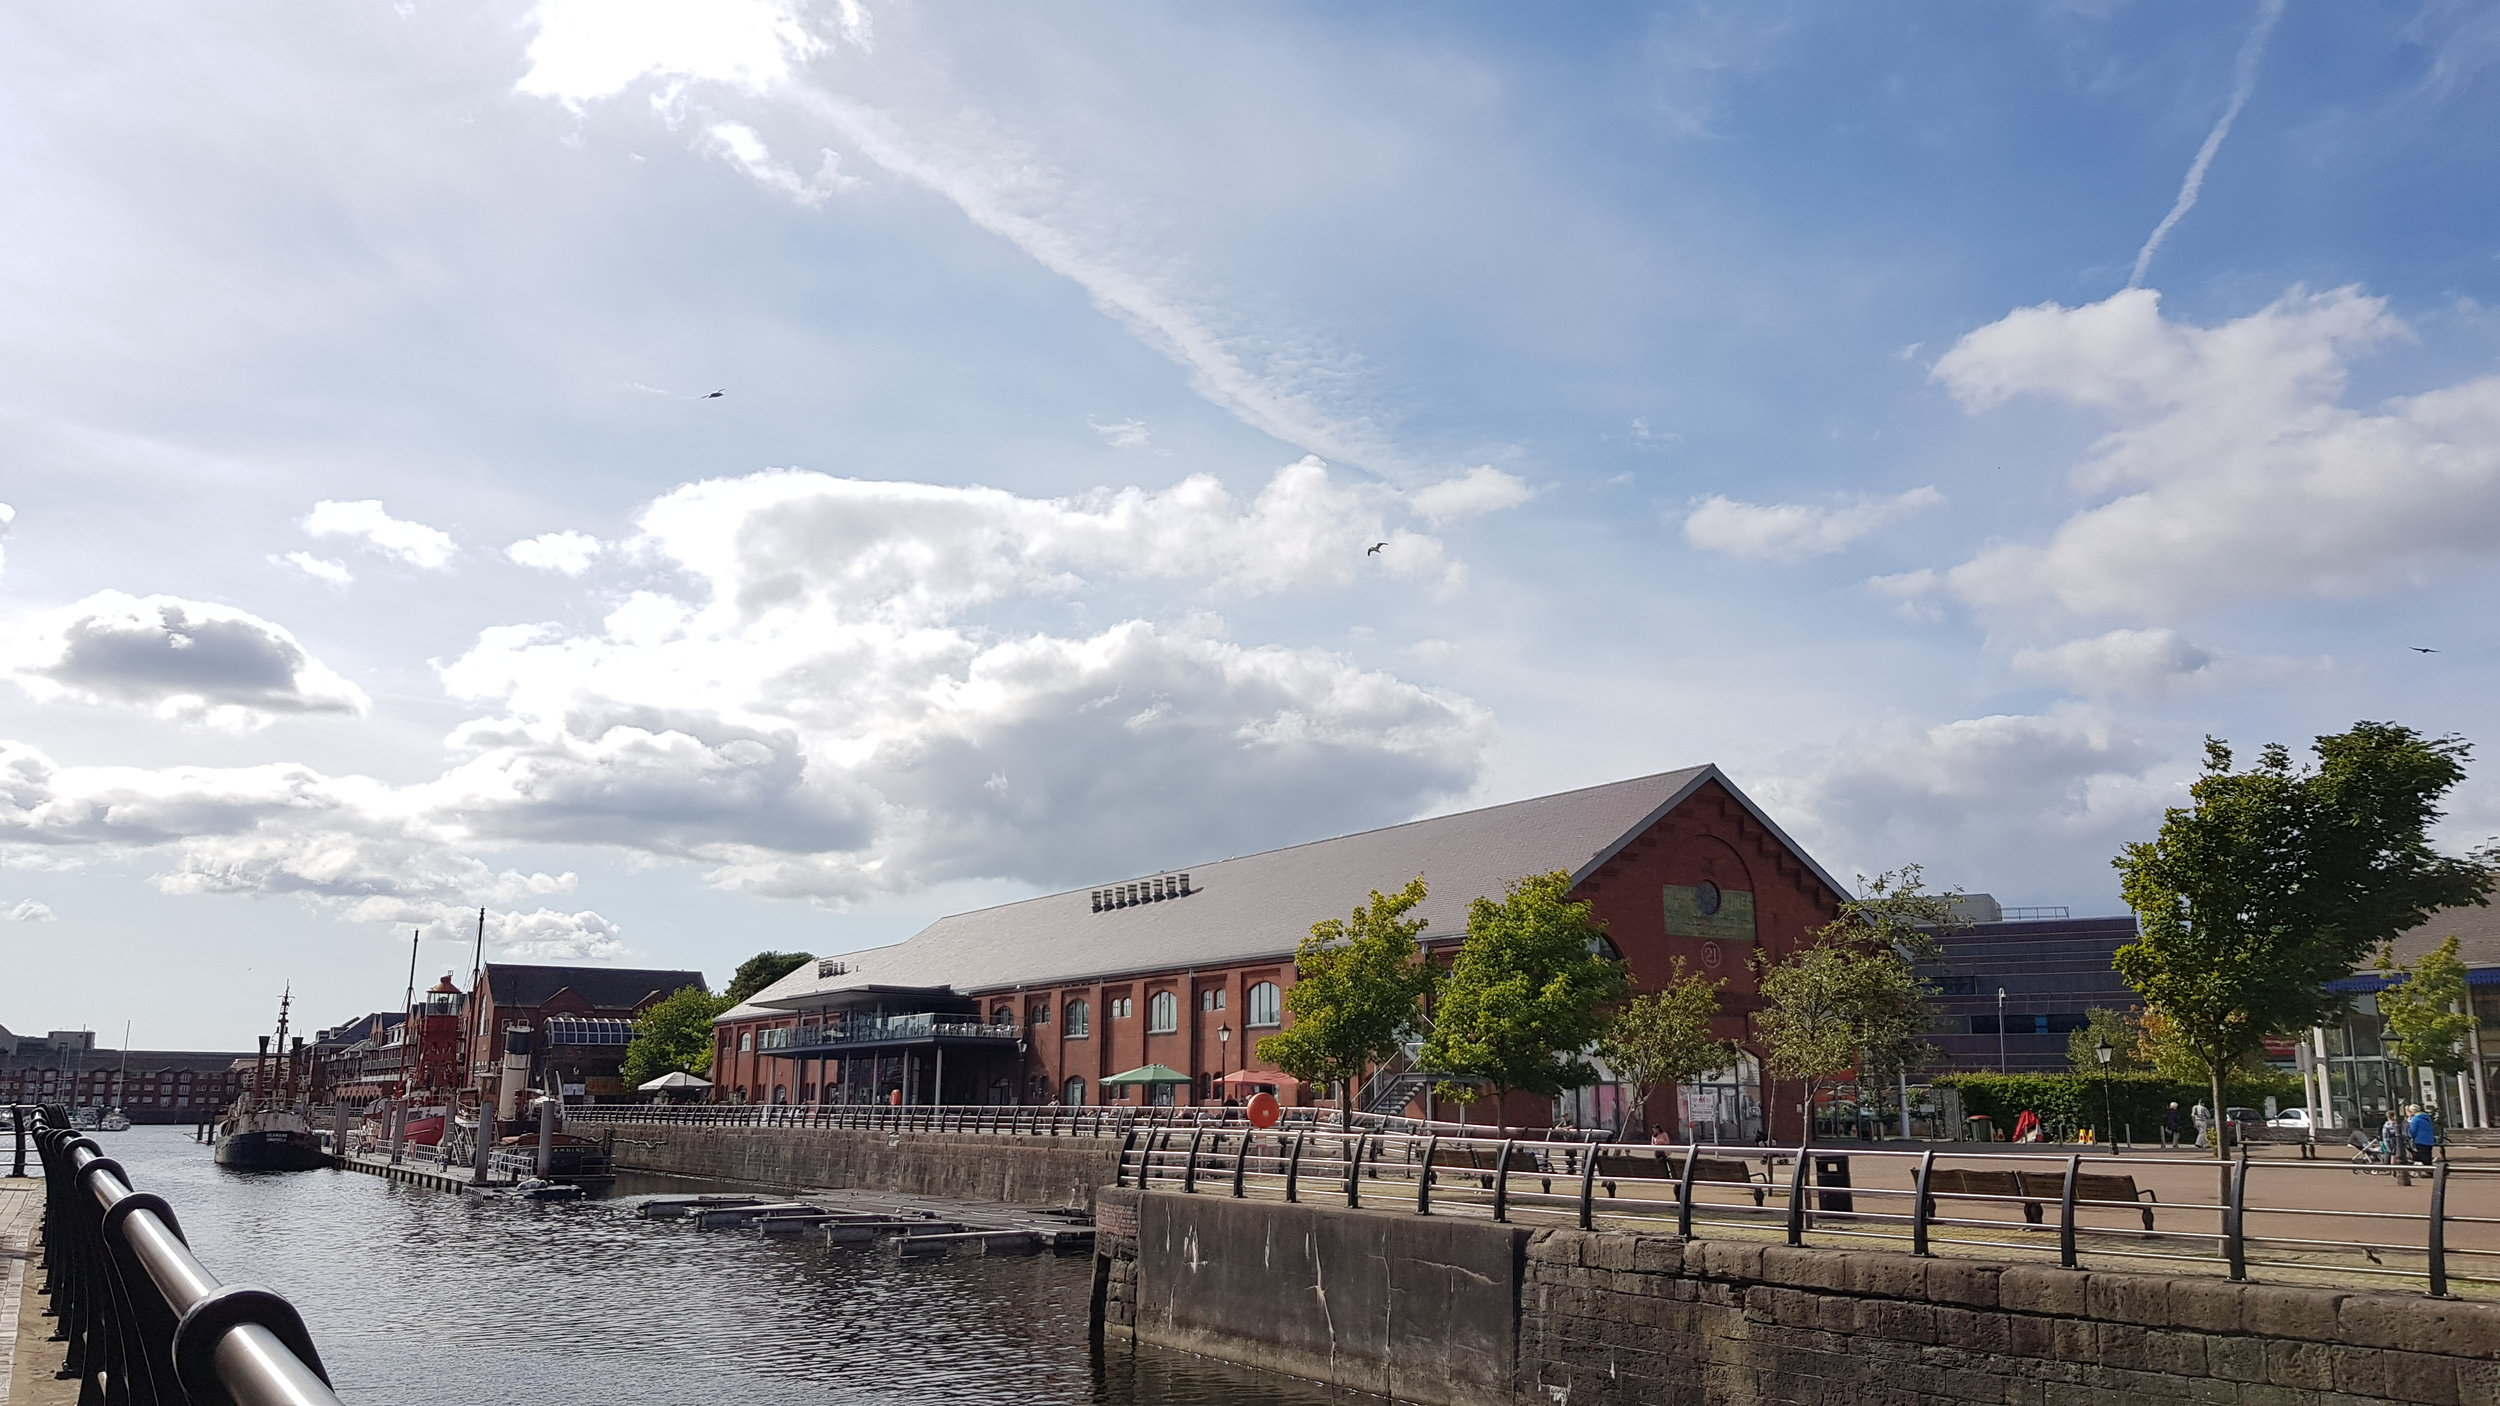 National Waterfront Museum, Swansea